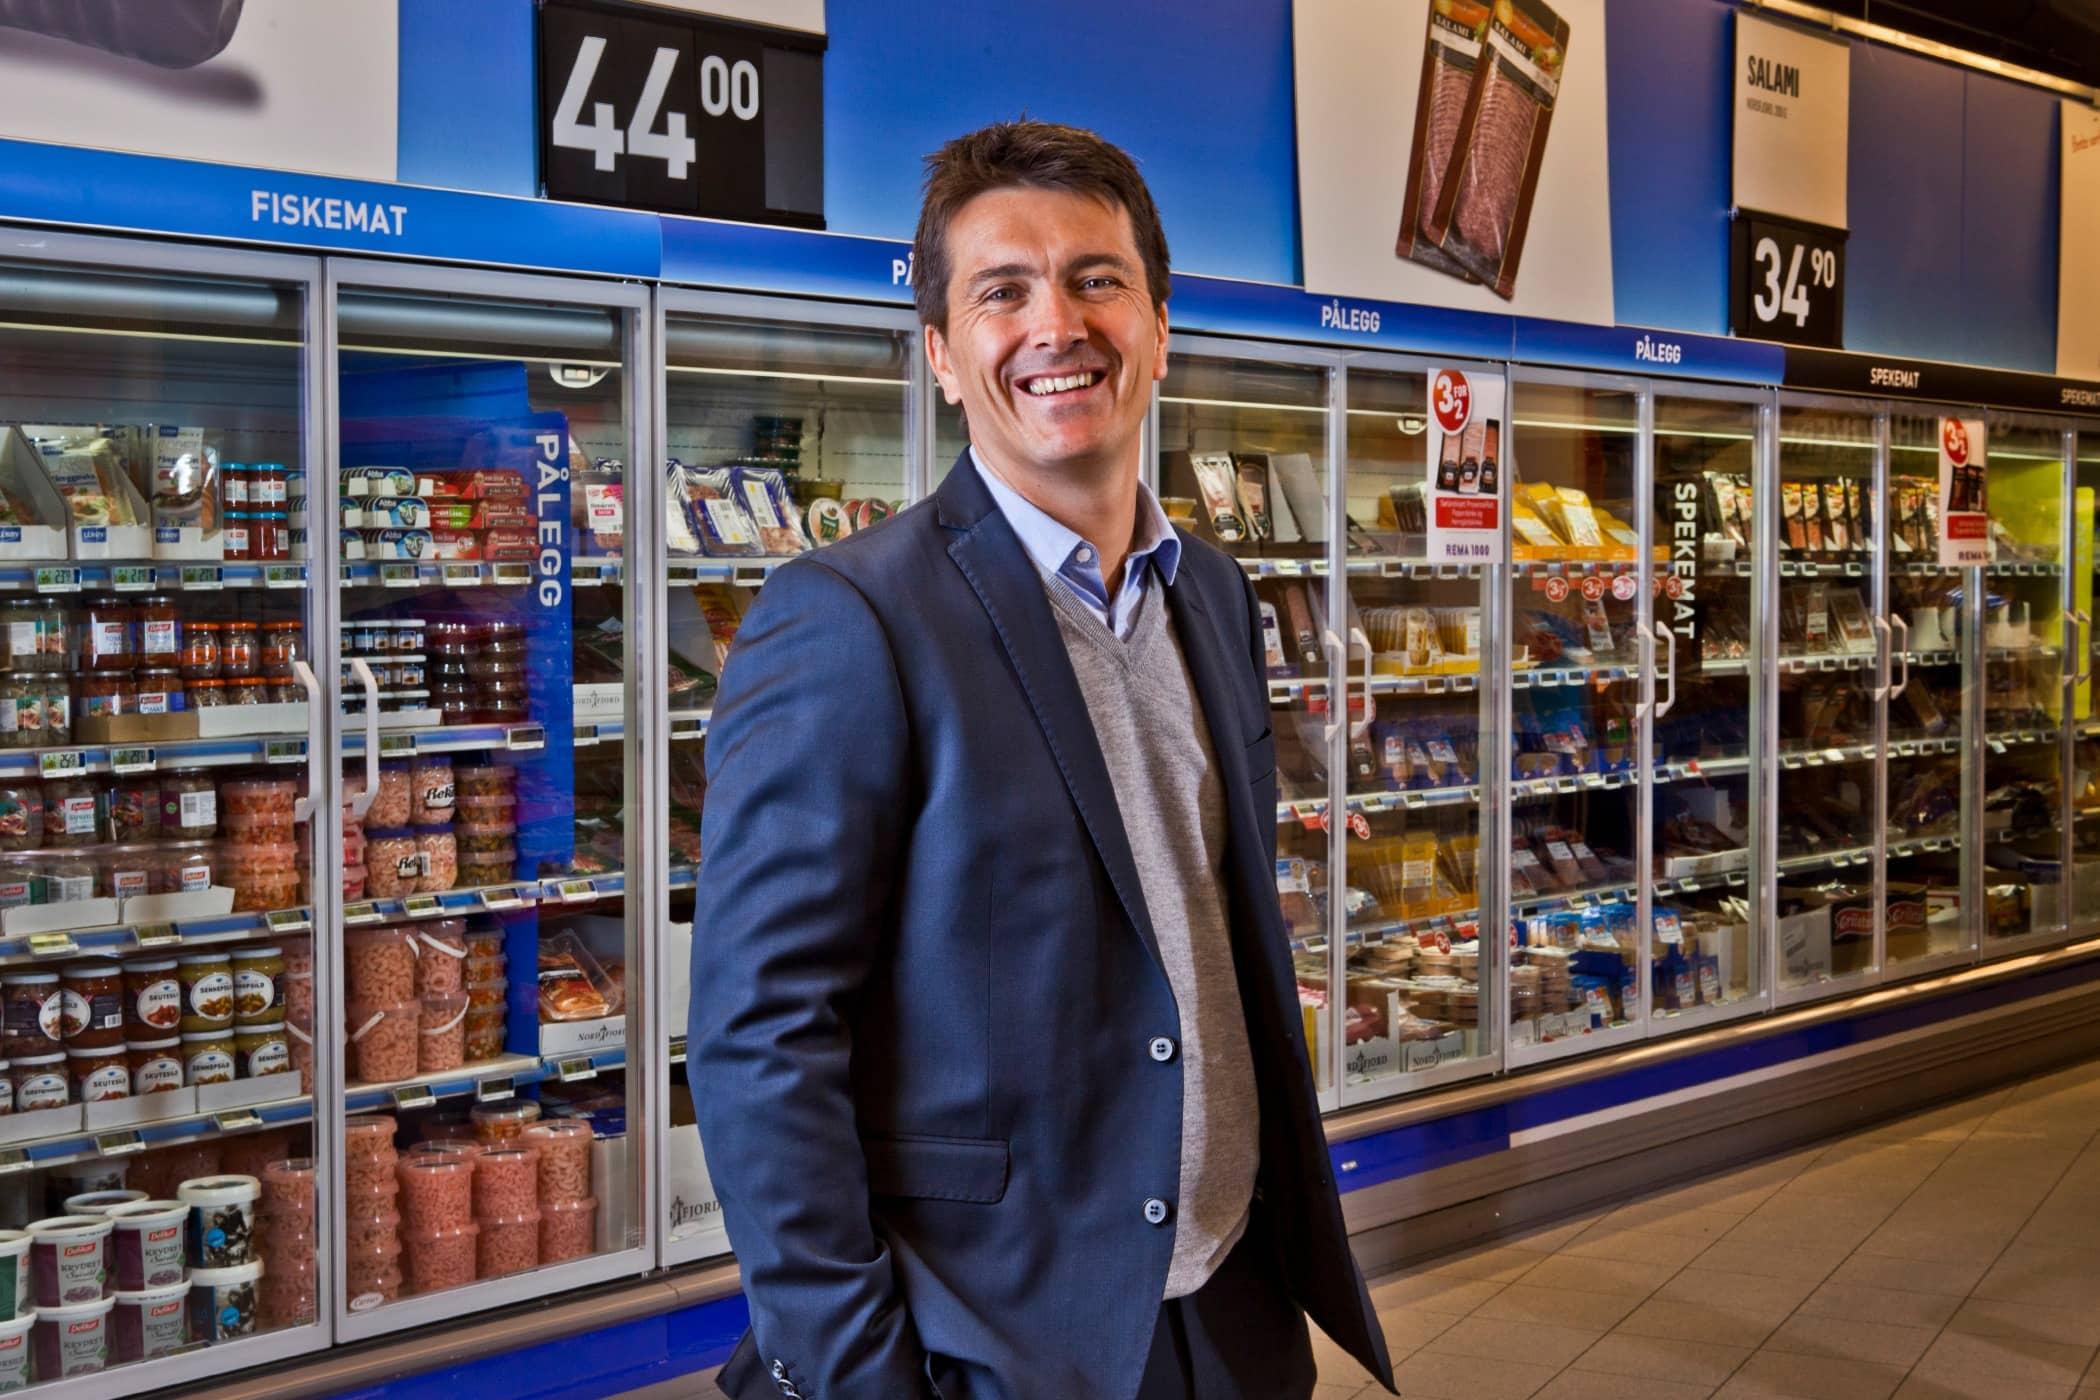 Supermarket, Retail, Product